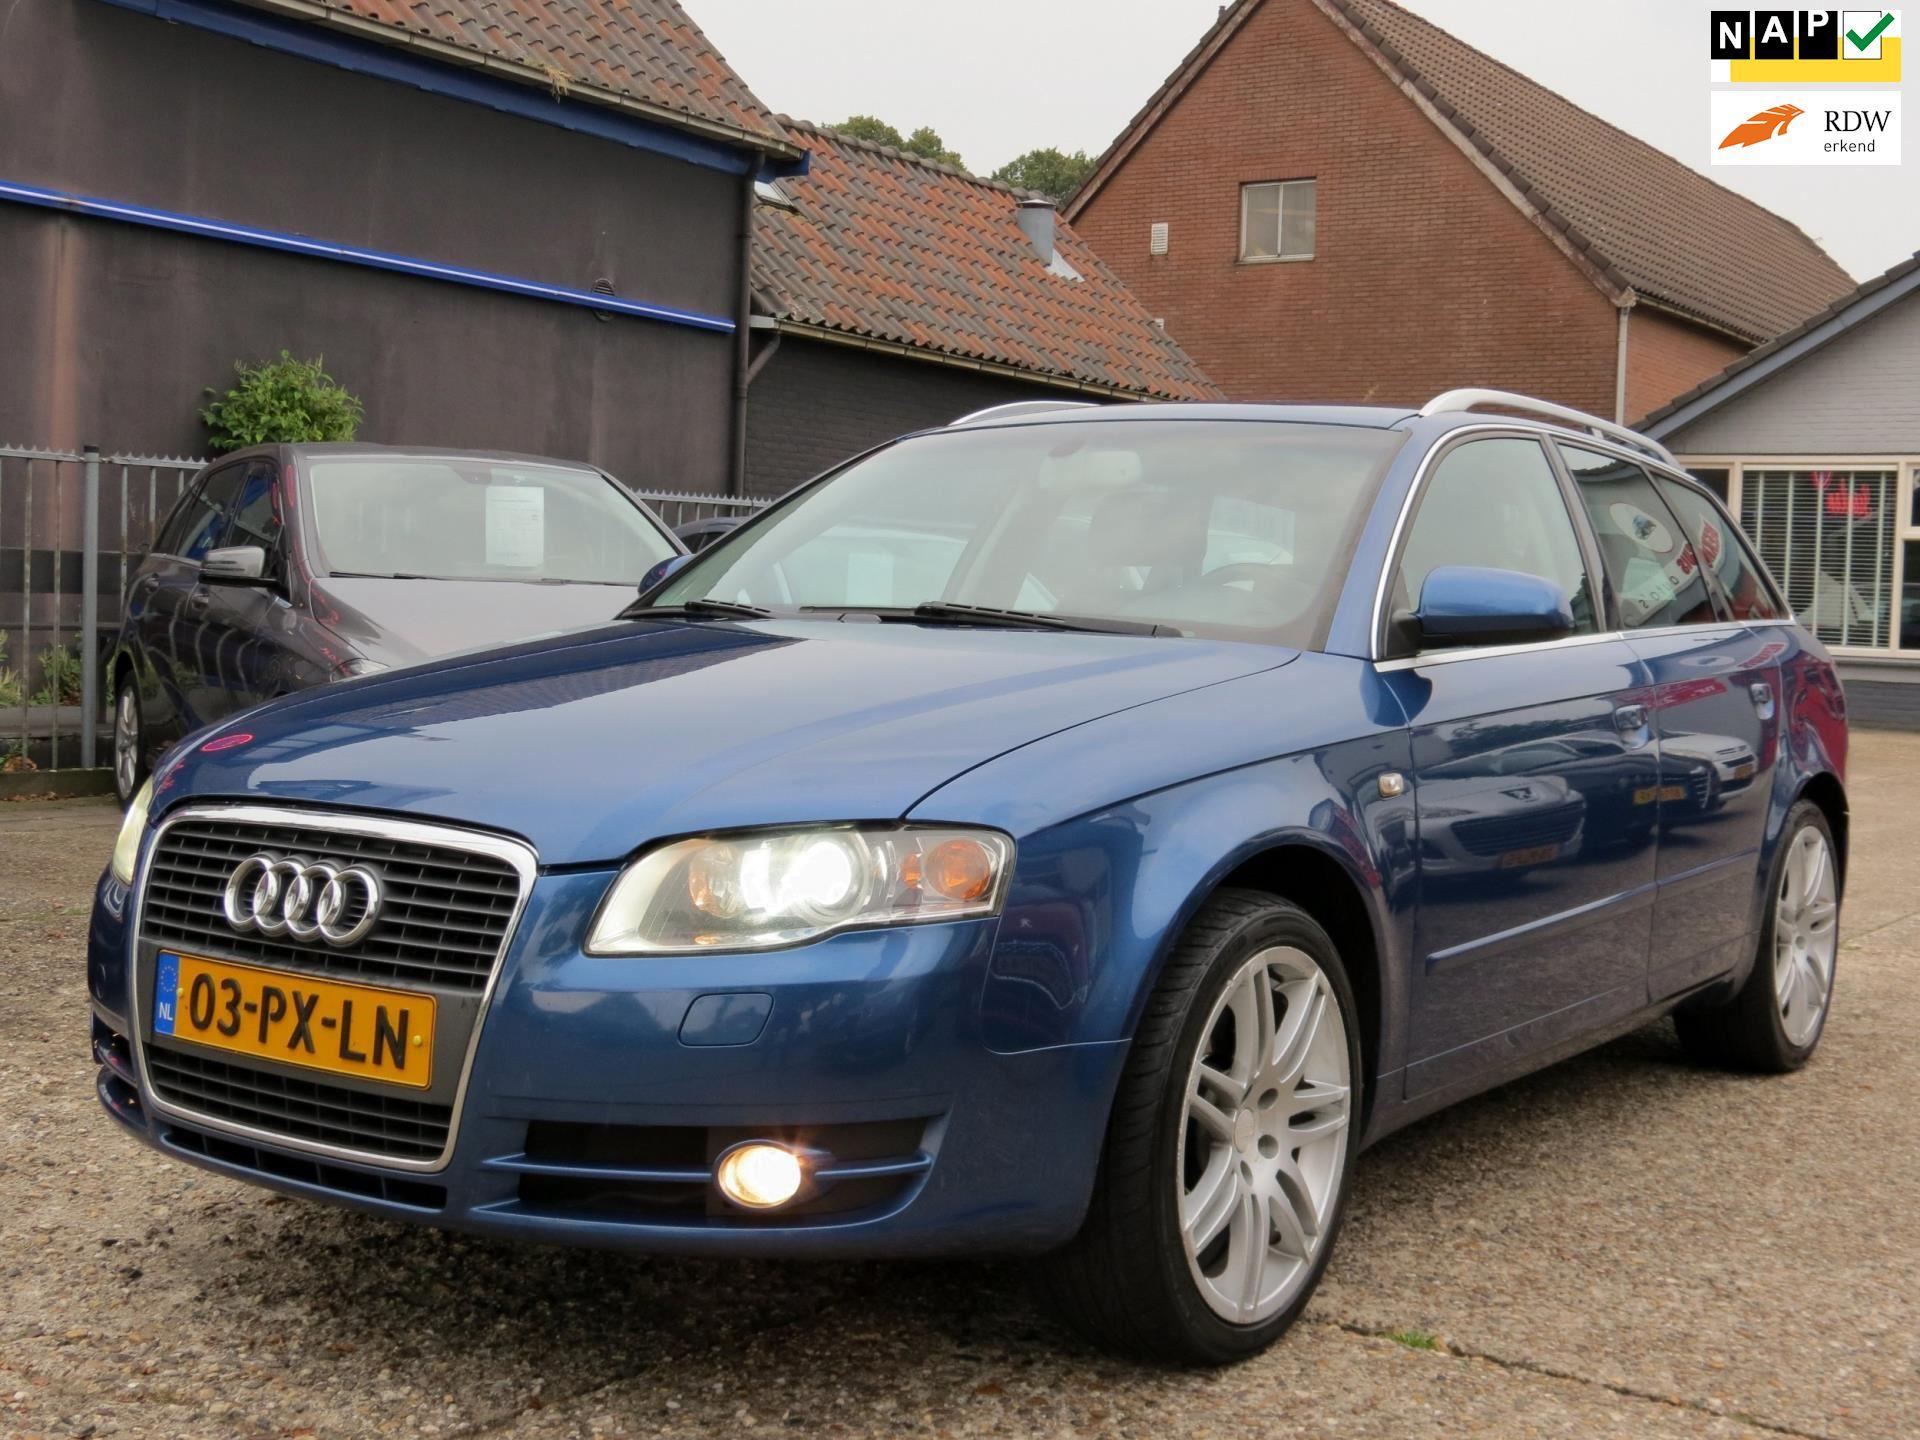 Audi A4 Avant occasion - Beekhuis Auto's